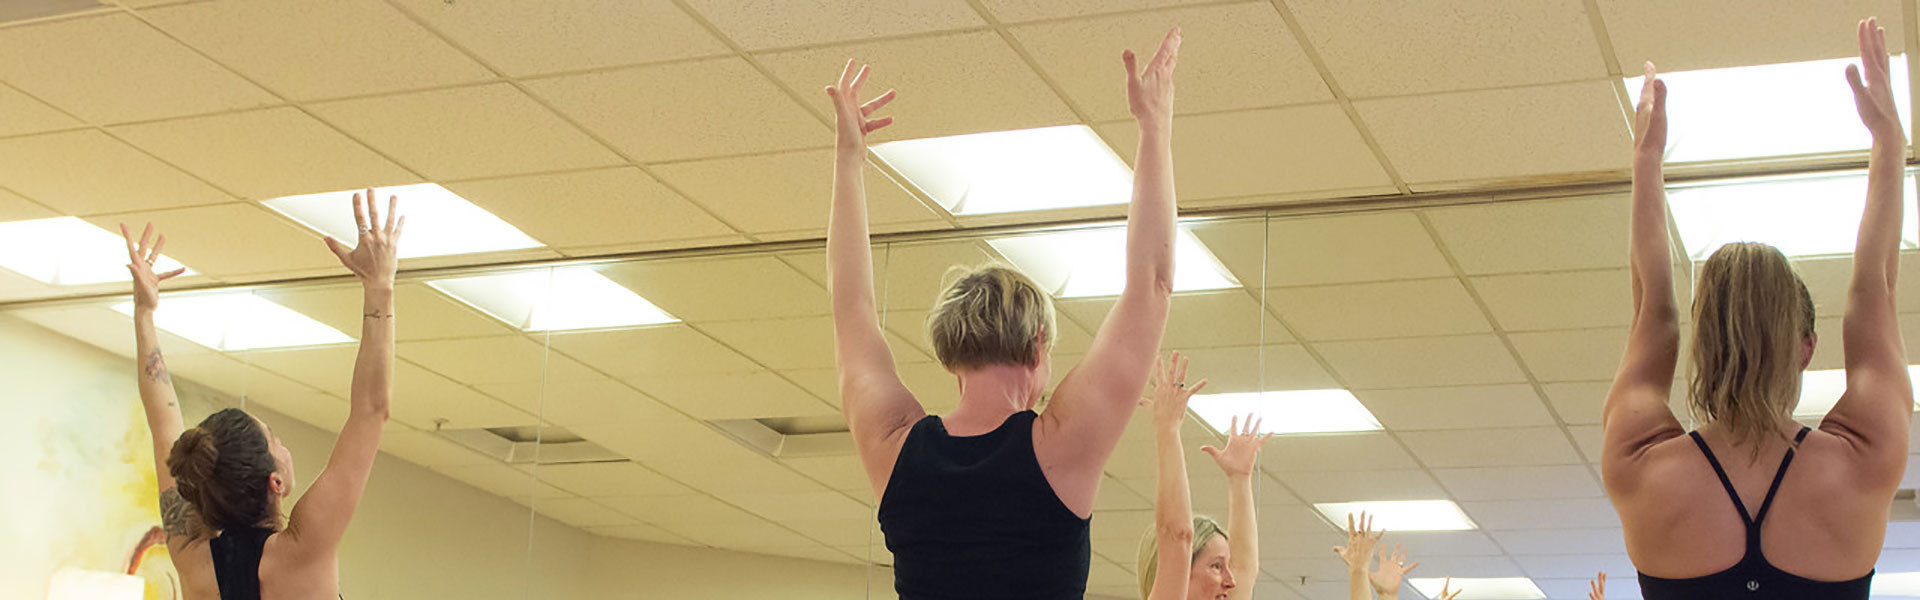 Yoga Kula Project Park City, Utah | Boutique Yoga Studio